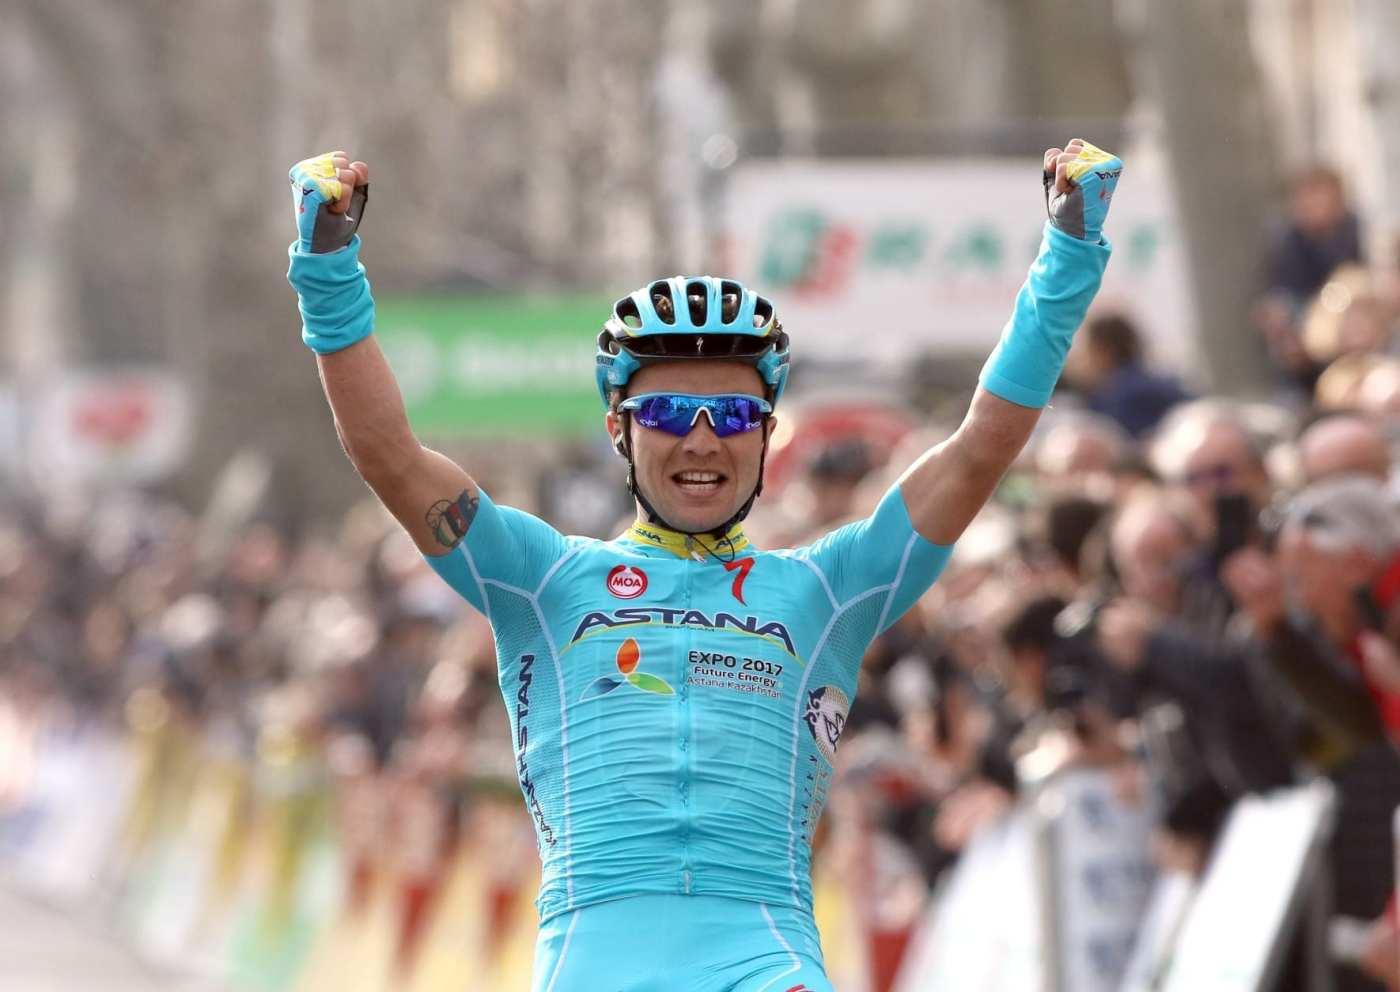 France-Paris-Nice-Cycling9-1770x1254.jpeg